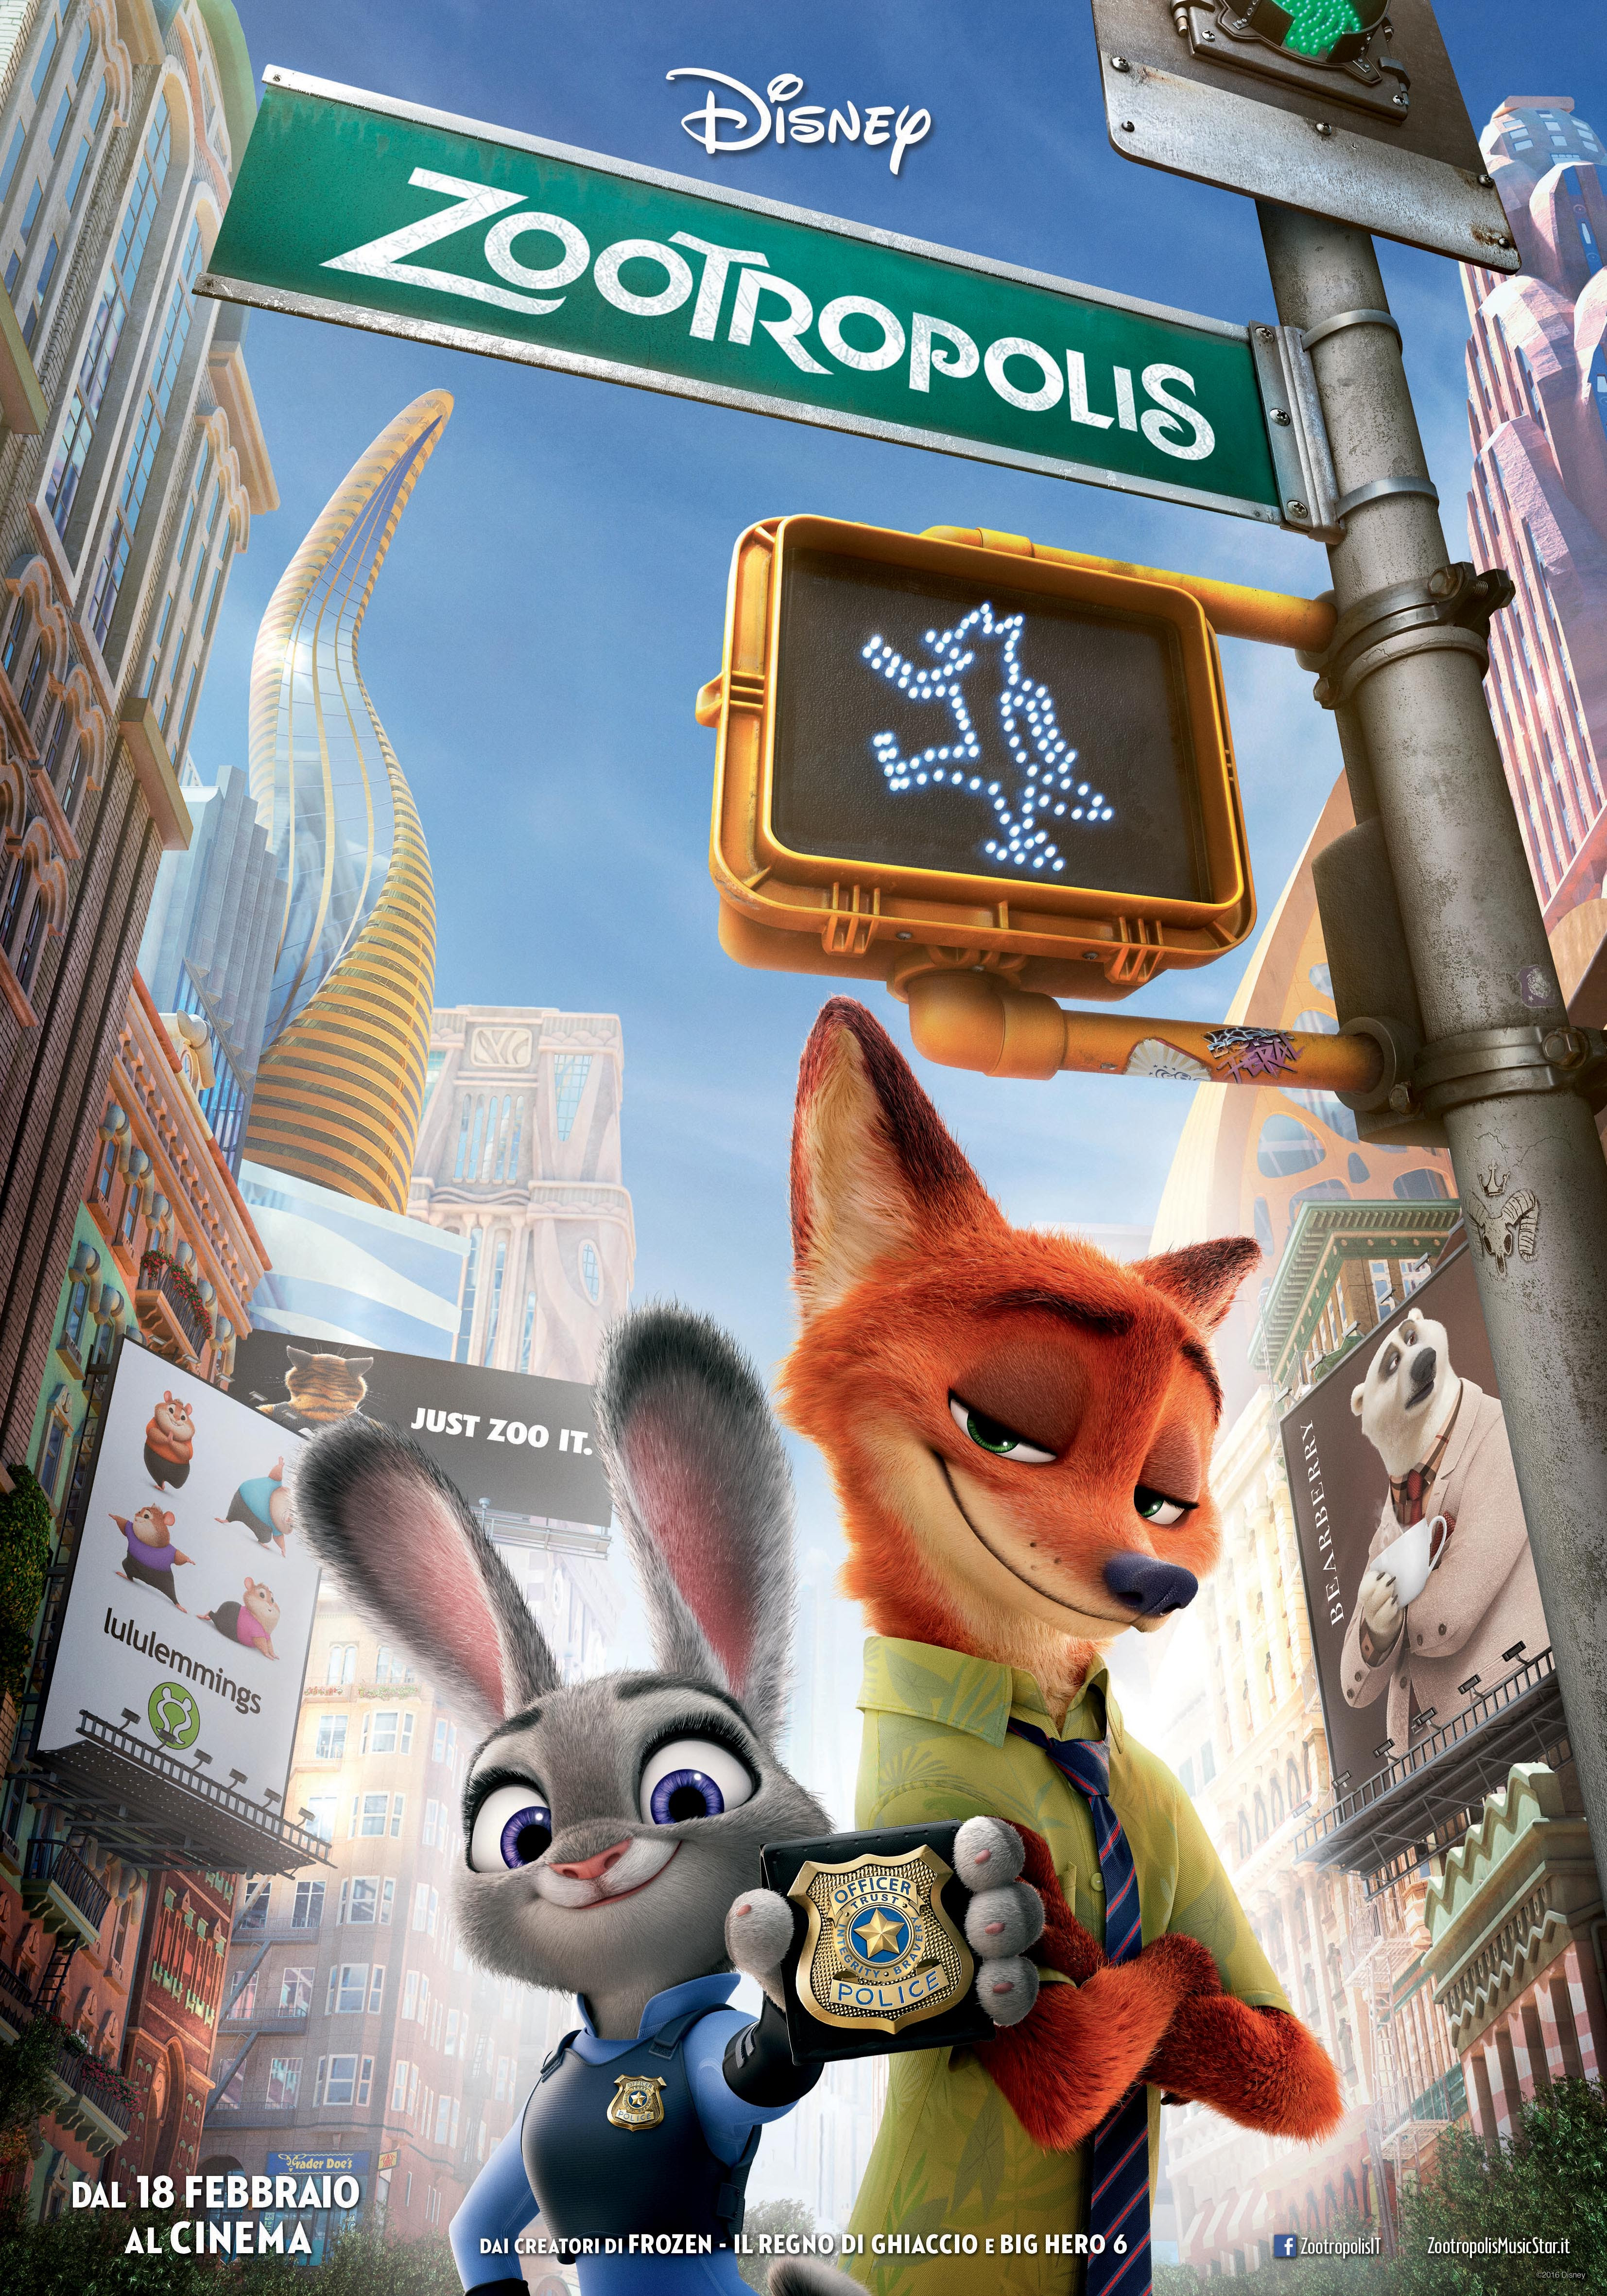 Zootropolis Sta Per Arrivare Al Cinema on Bulletin Board Kids Monsters